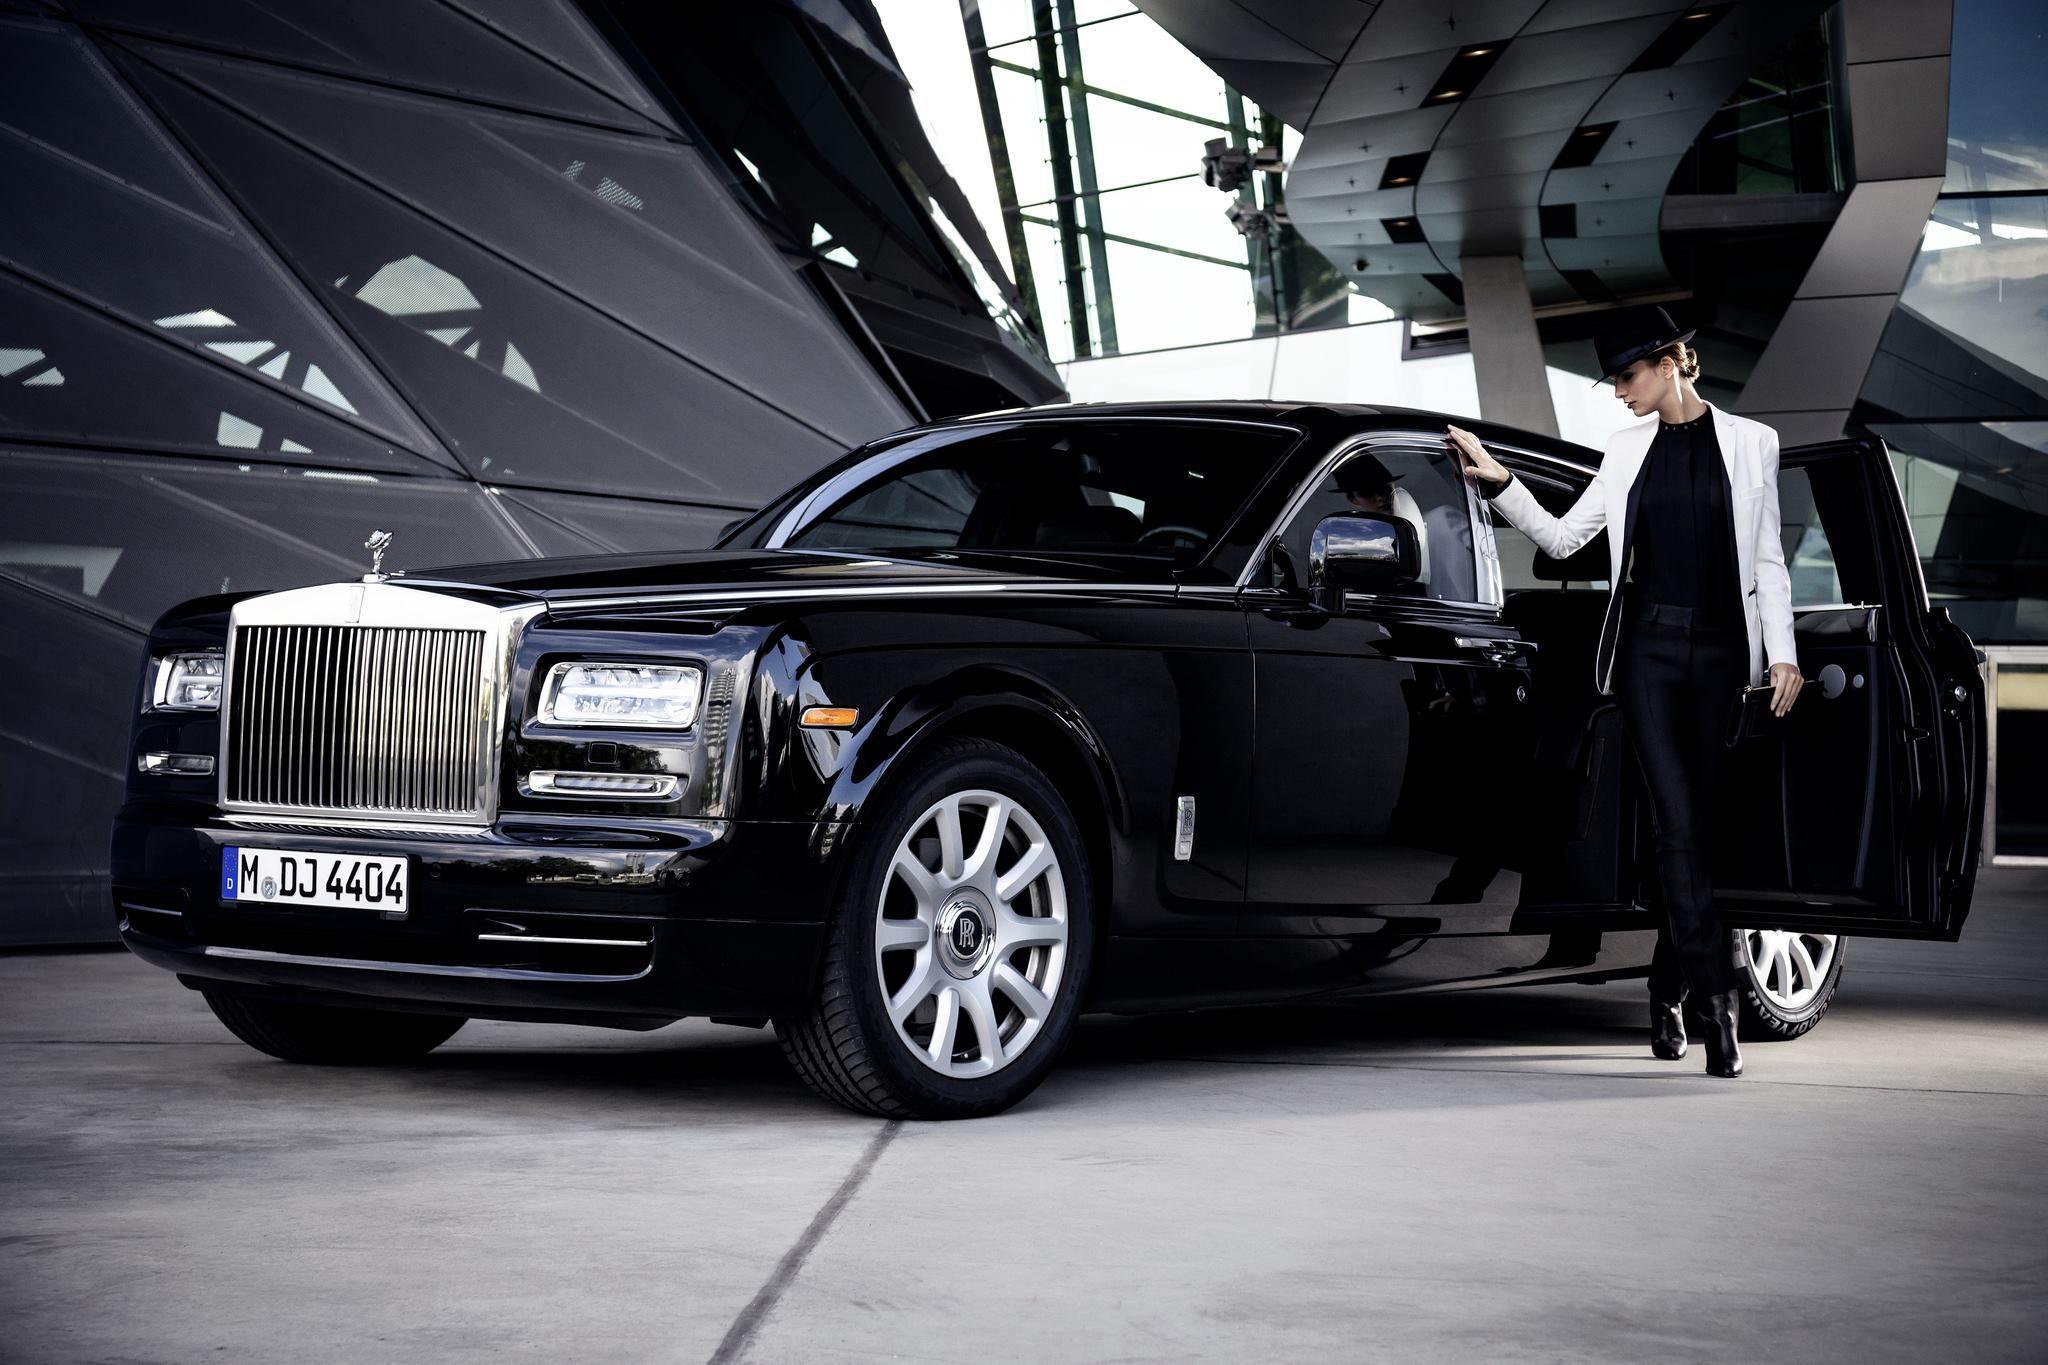 A sleek black phantom takes centre stage in this fashion